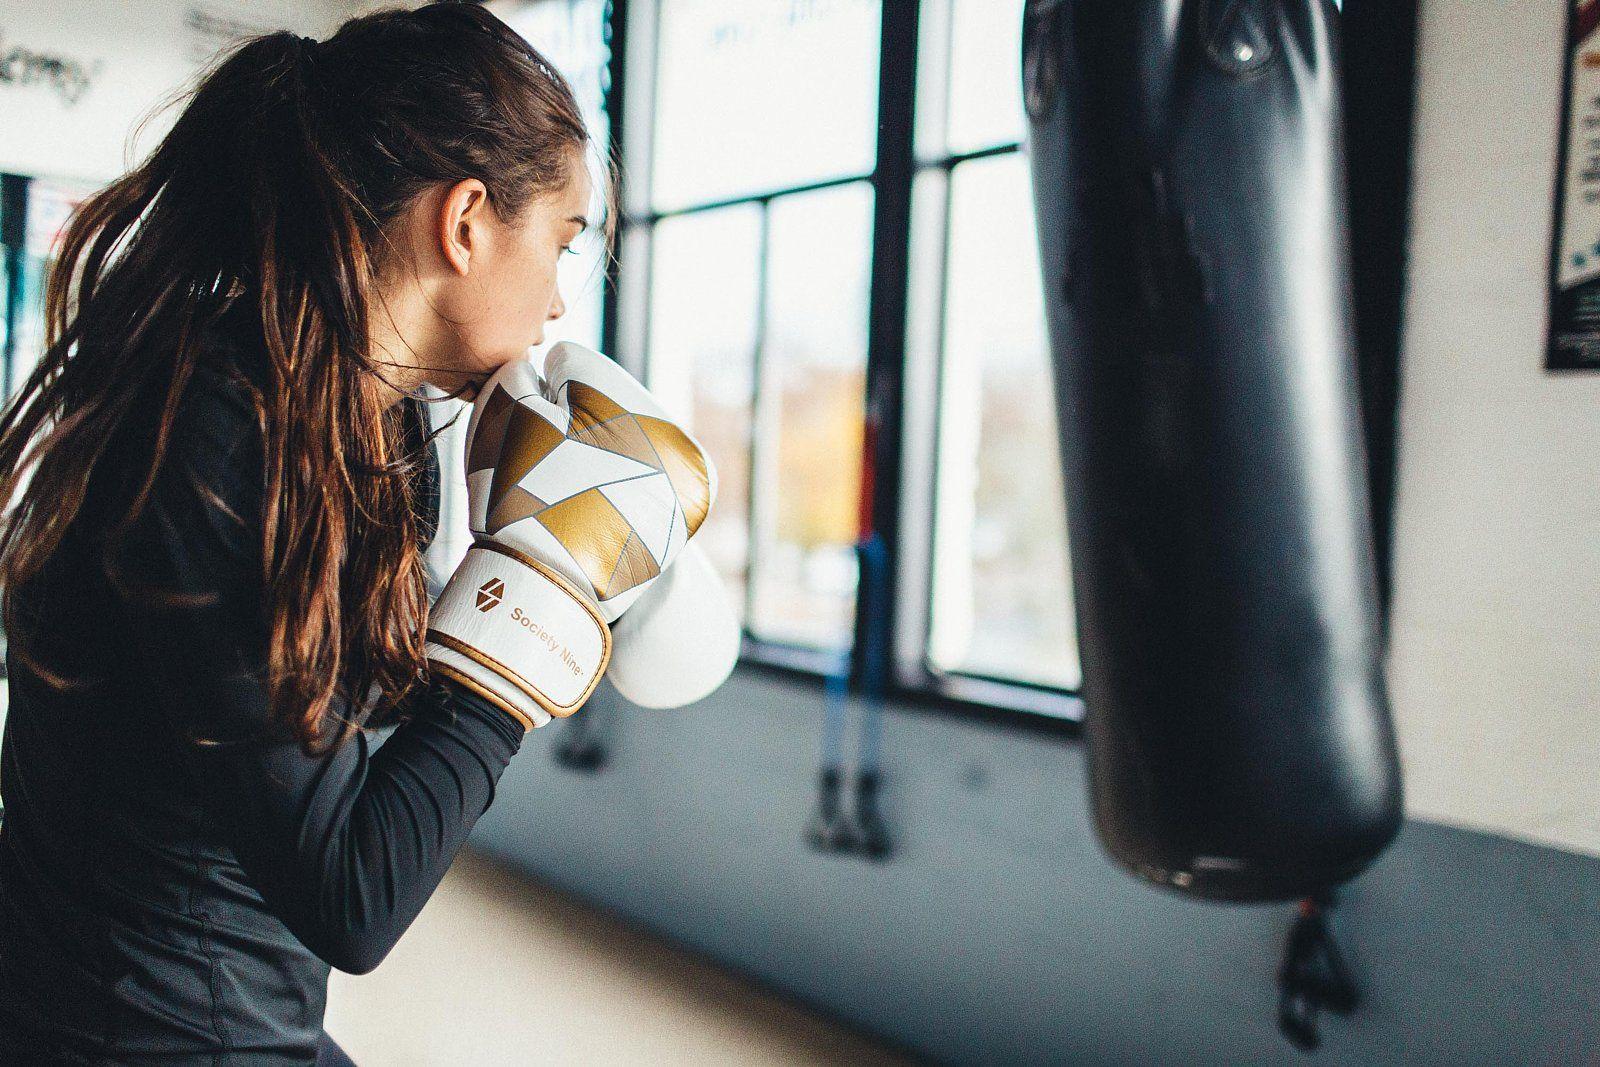 Картинки девушки с боксерскими перчатками